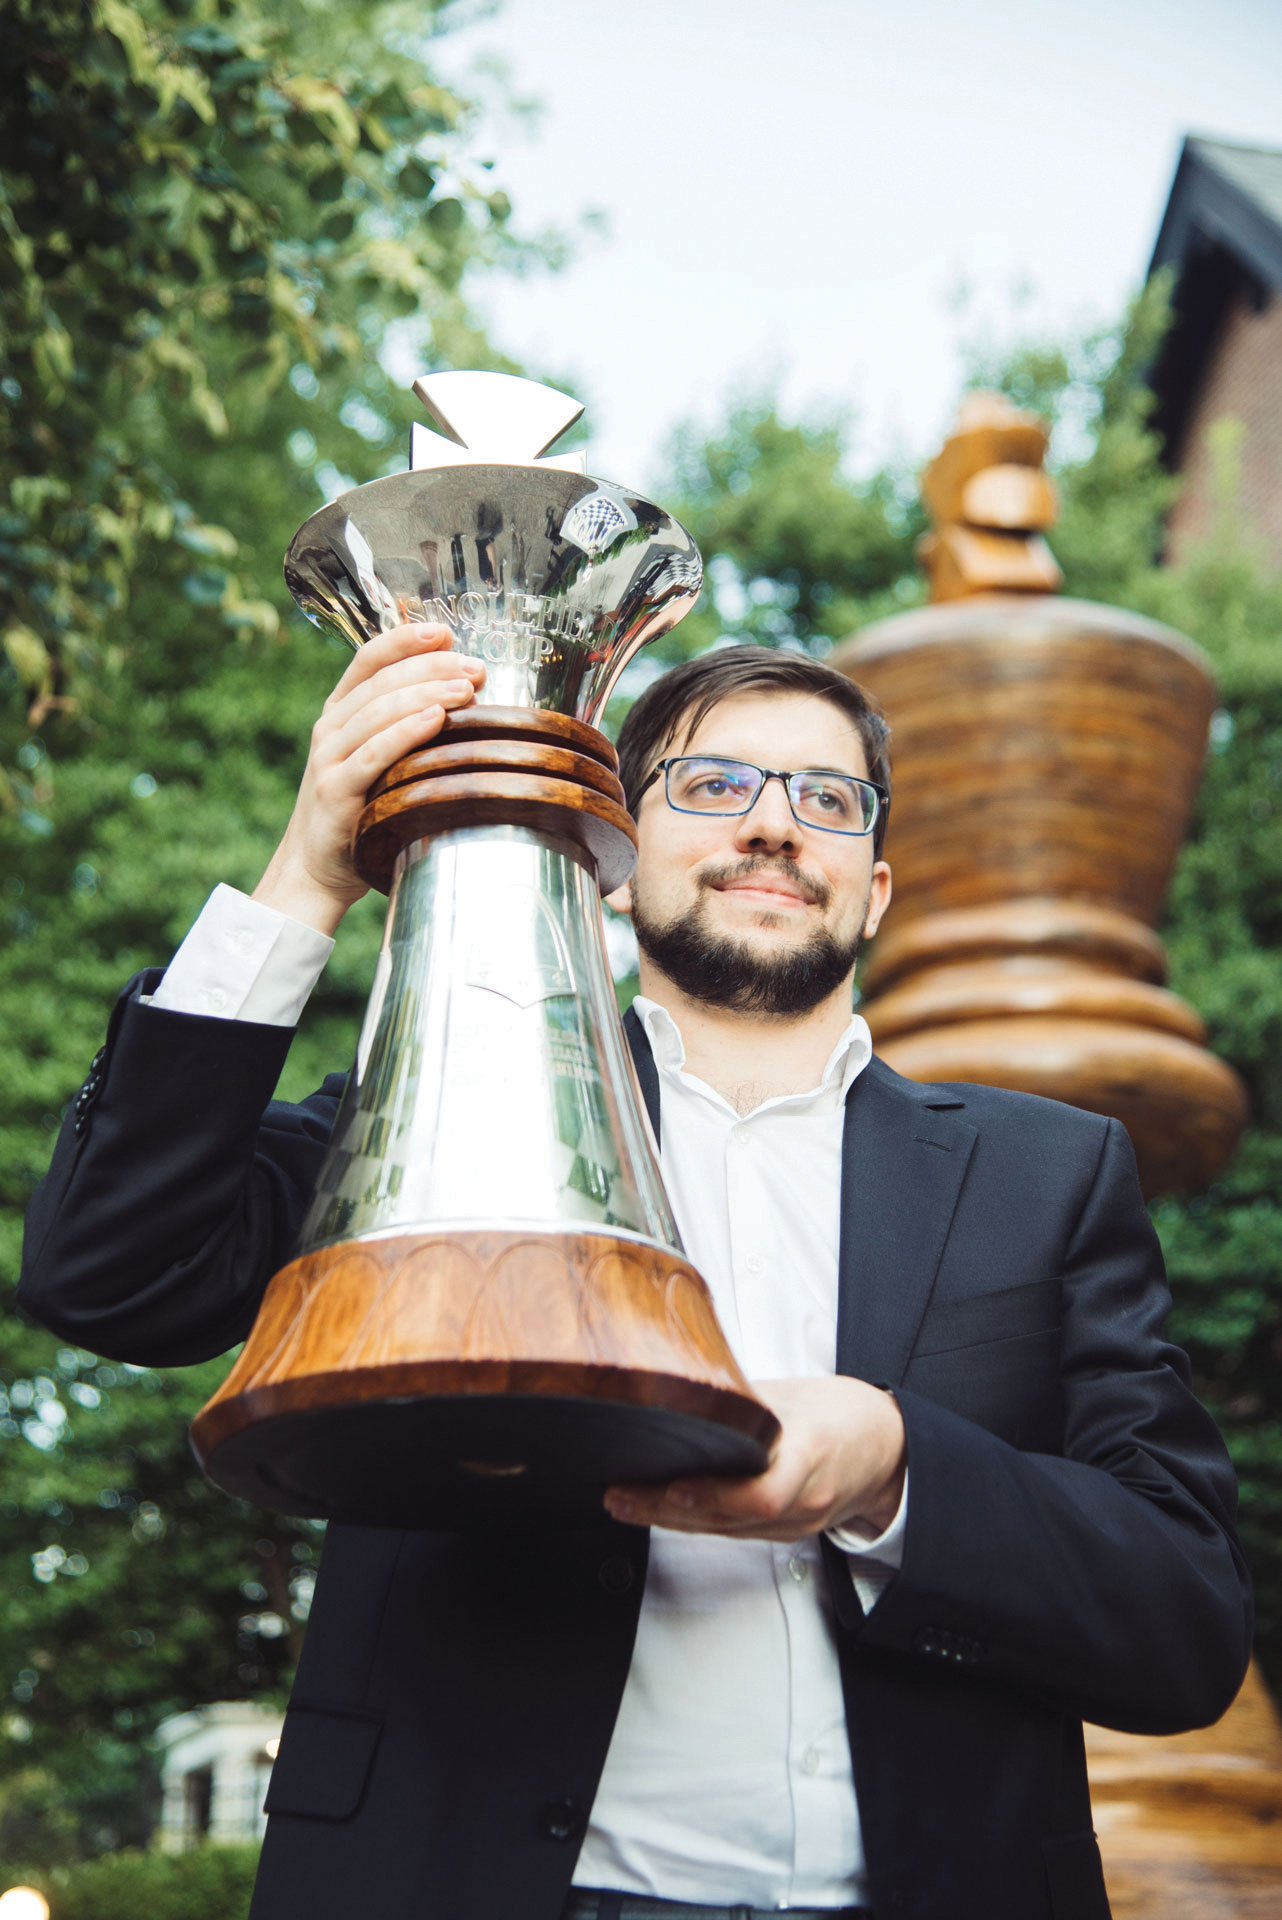 MVL wins the Sinquefield Cup